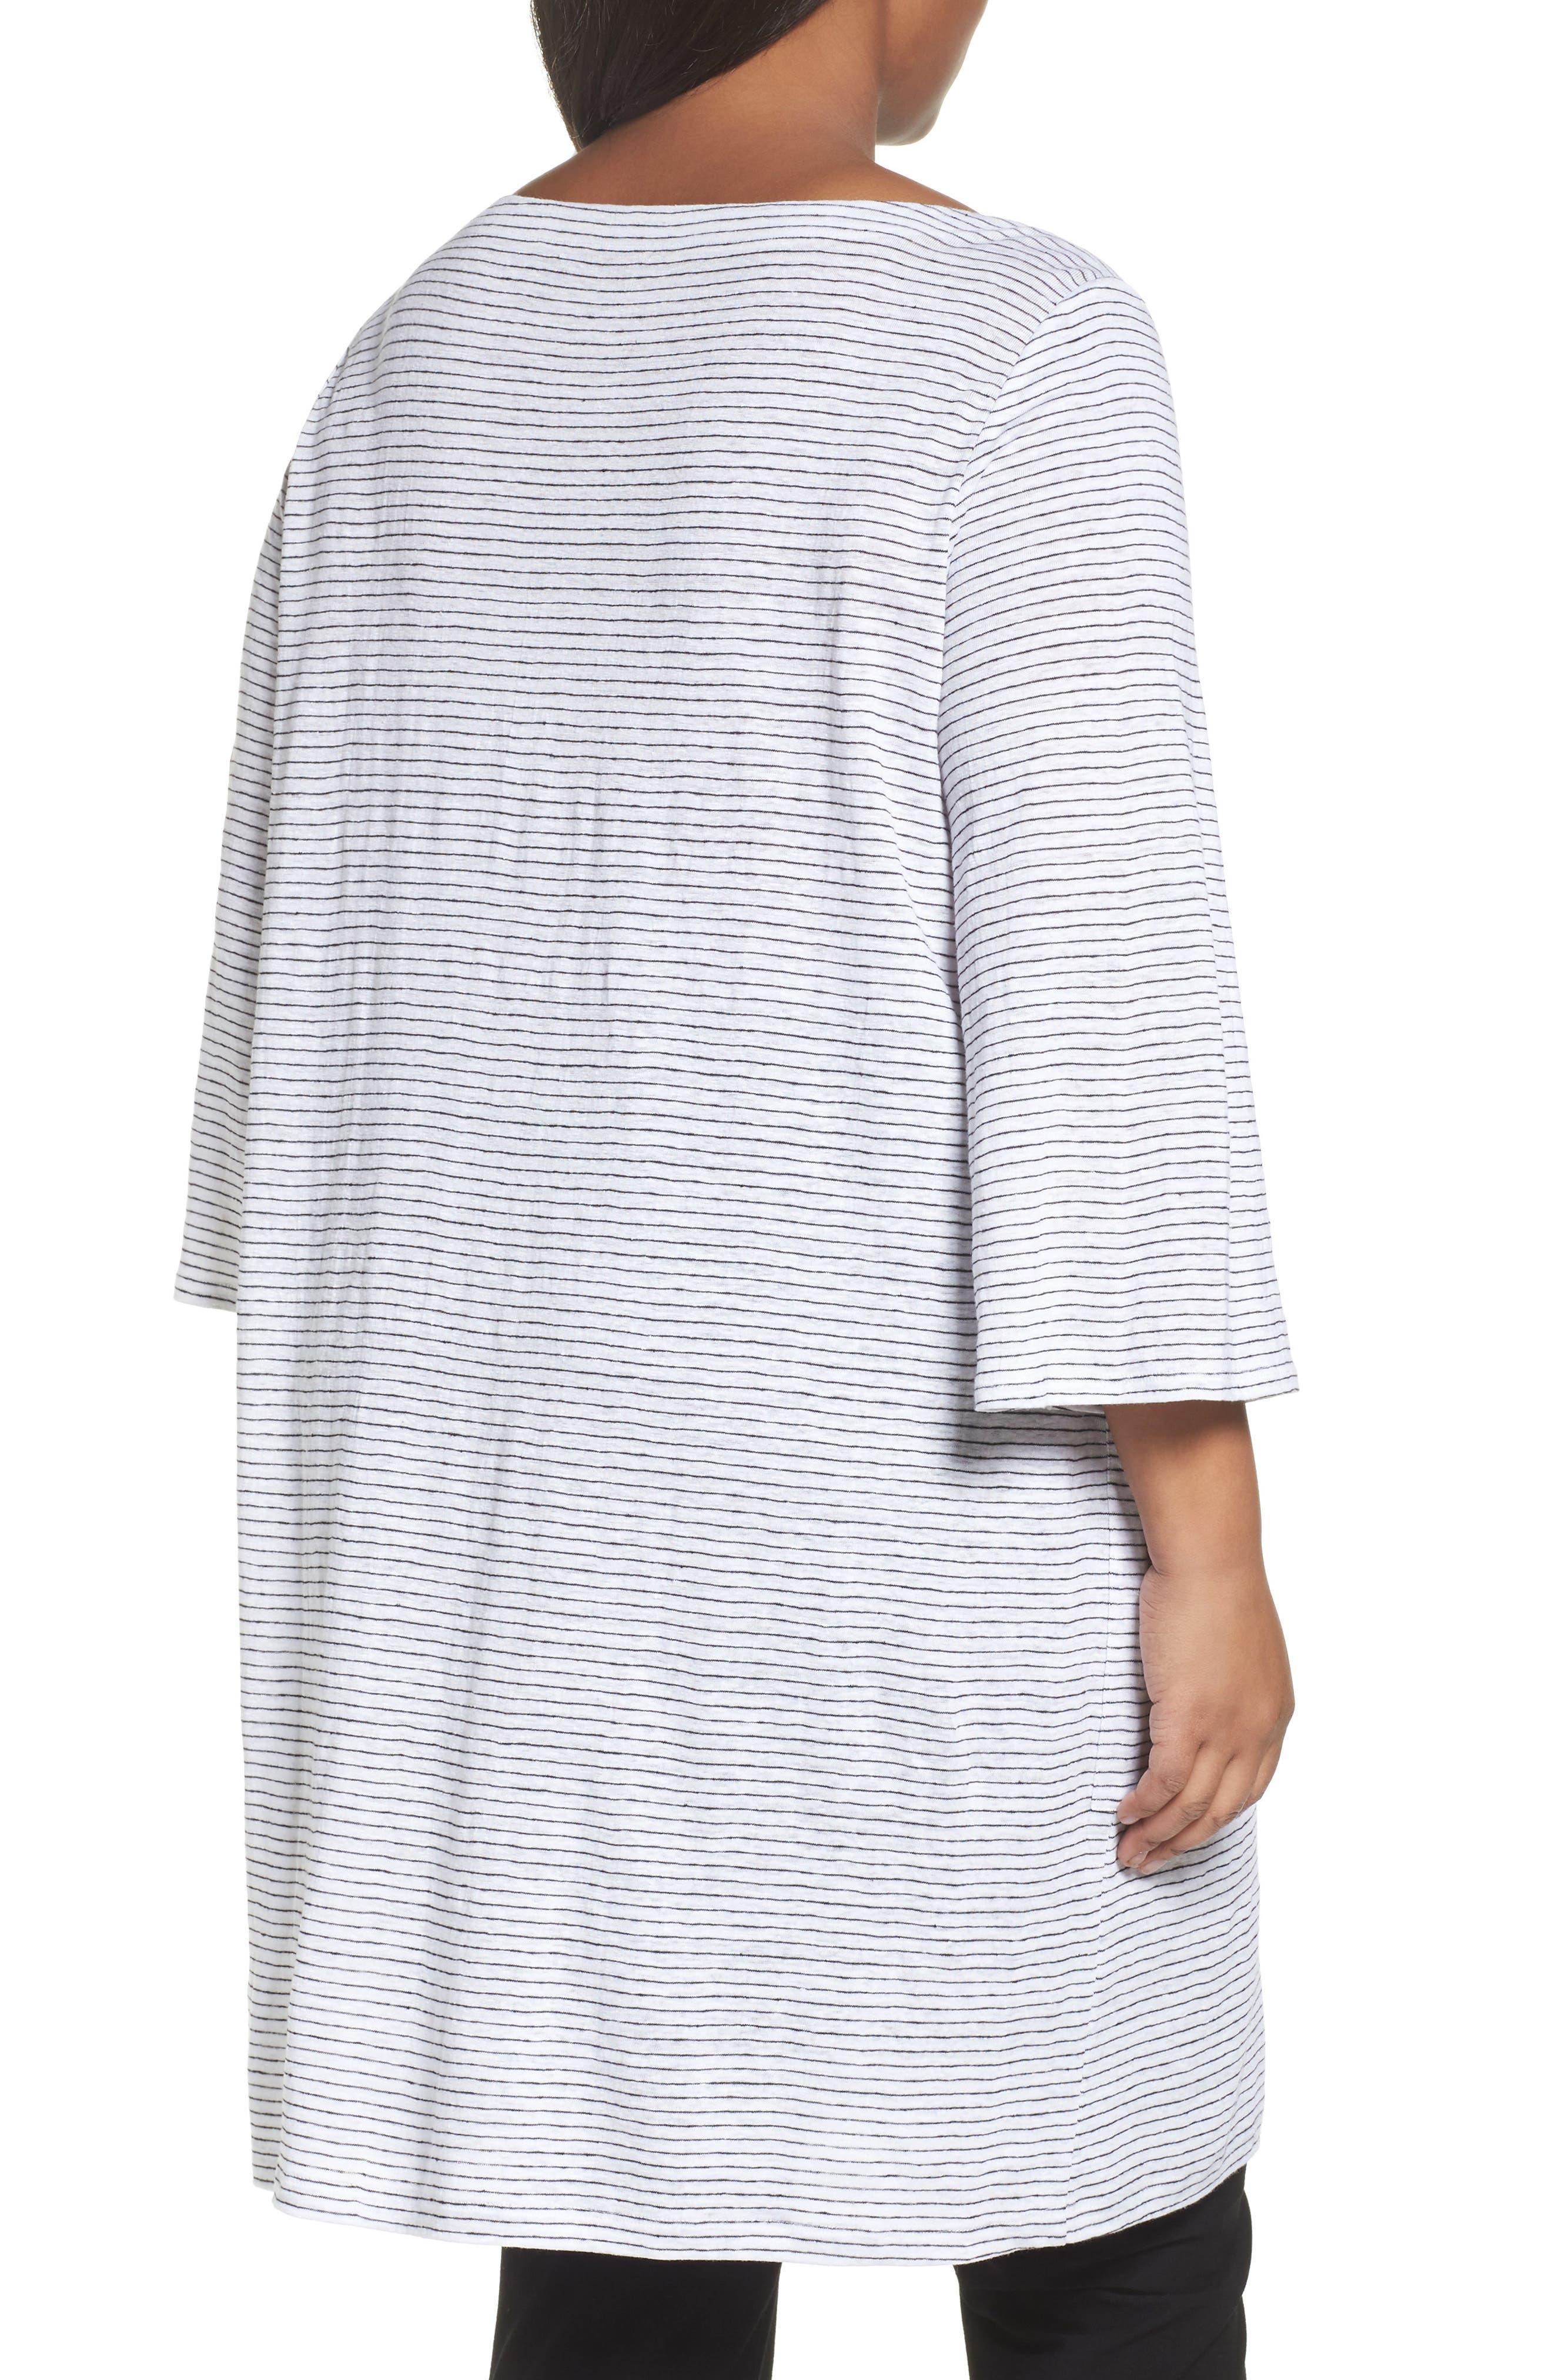 Organic Linen Shift Dress,                             Alternate thumbnail 2, color,                             120